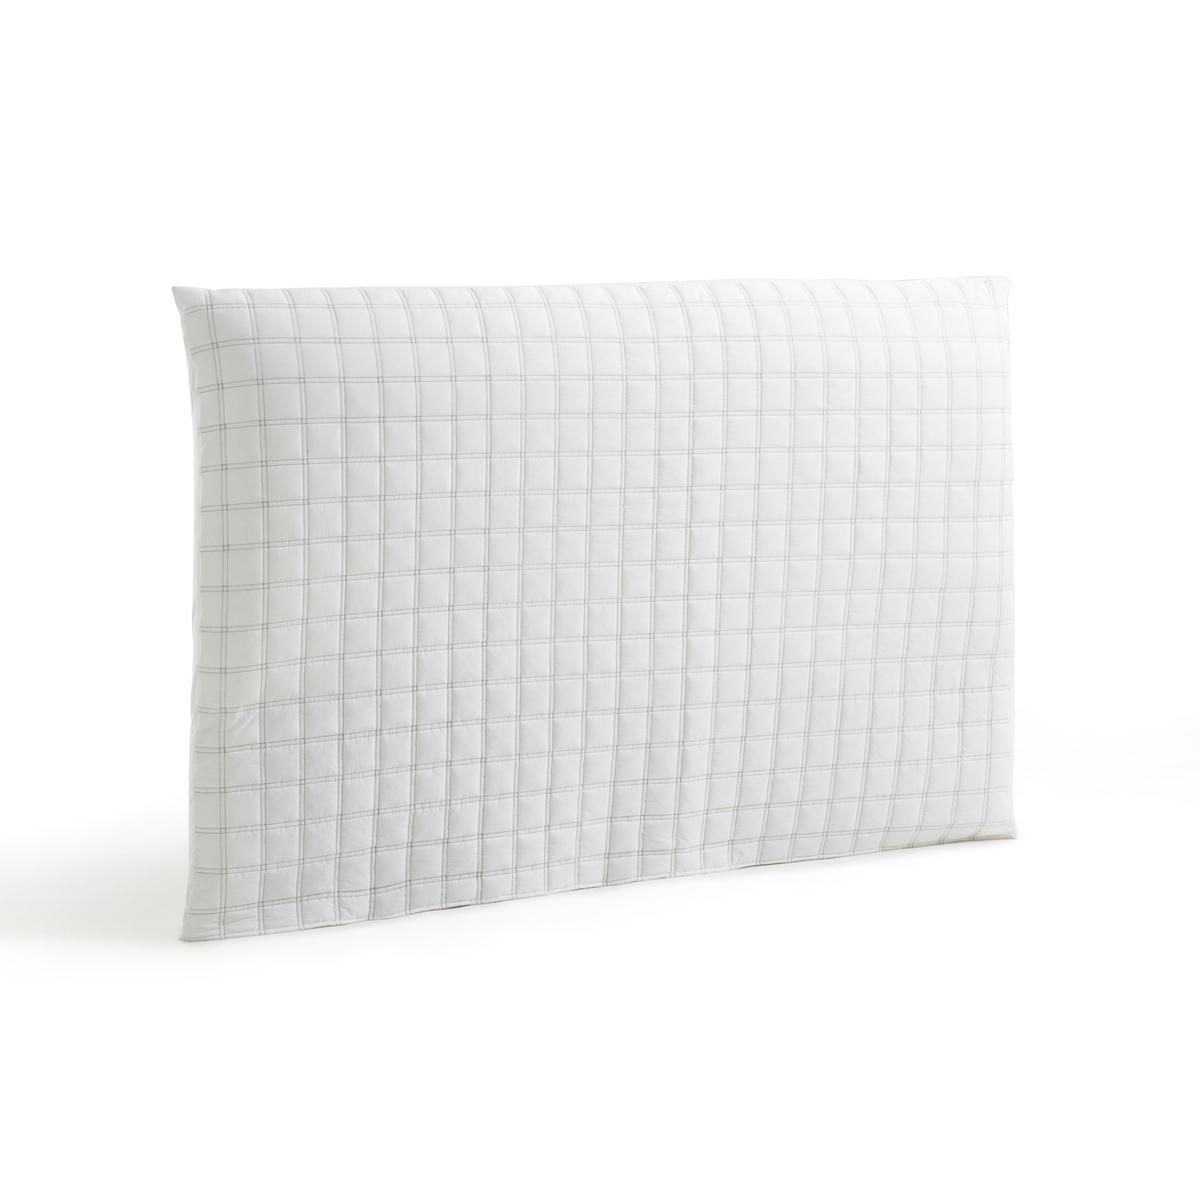 Чехол La Redoute На изголовье кровати стеганый из хлопка Mereson 160 см белый